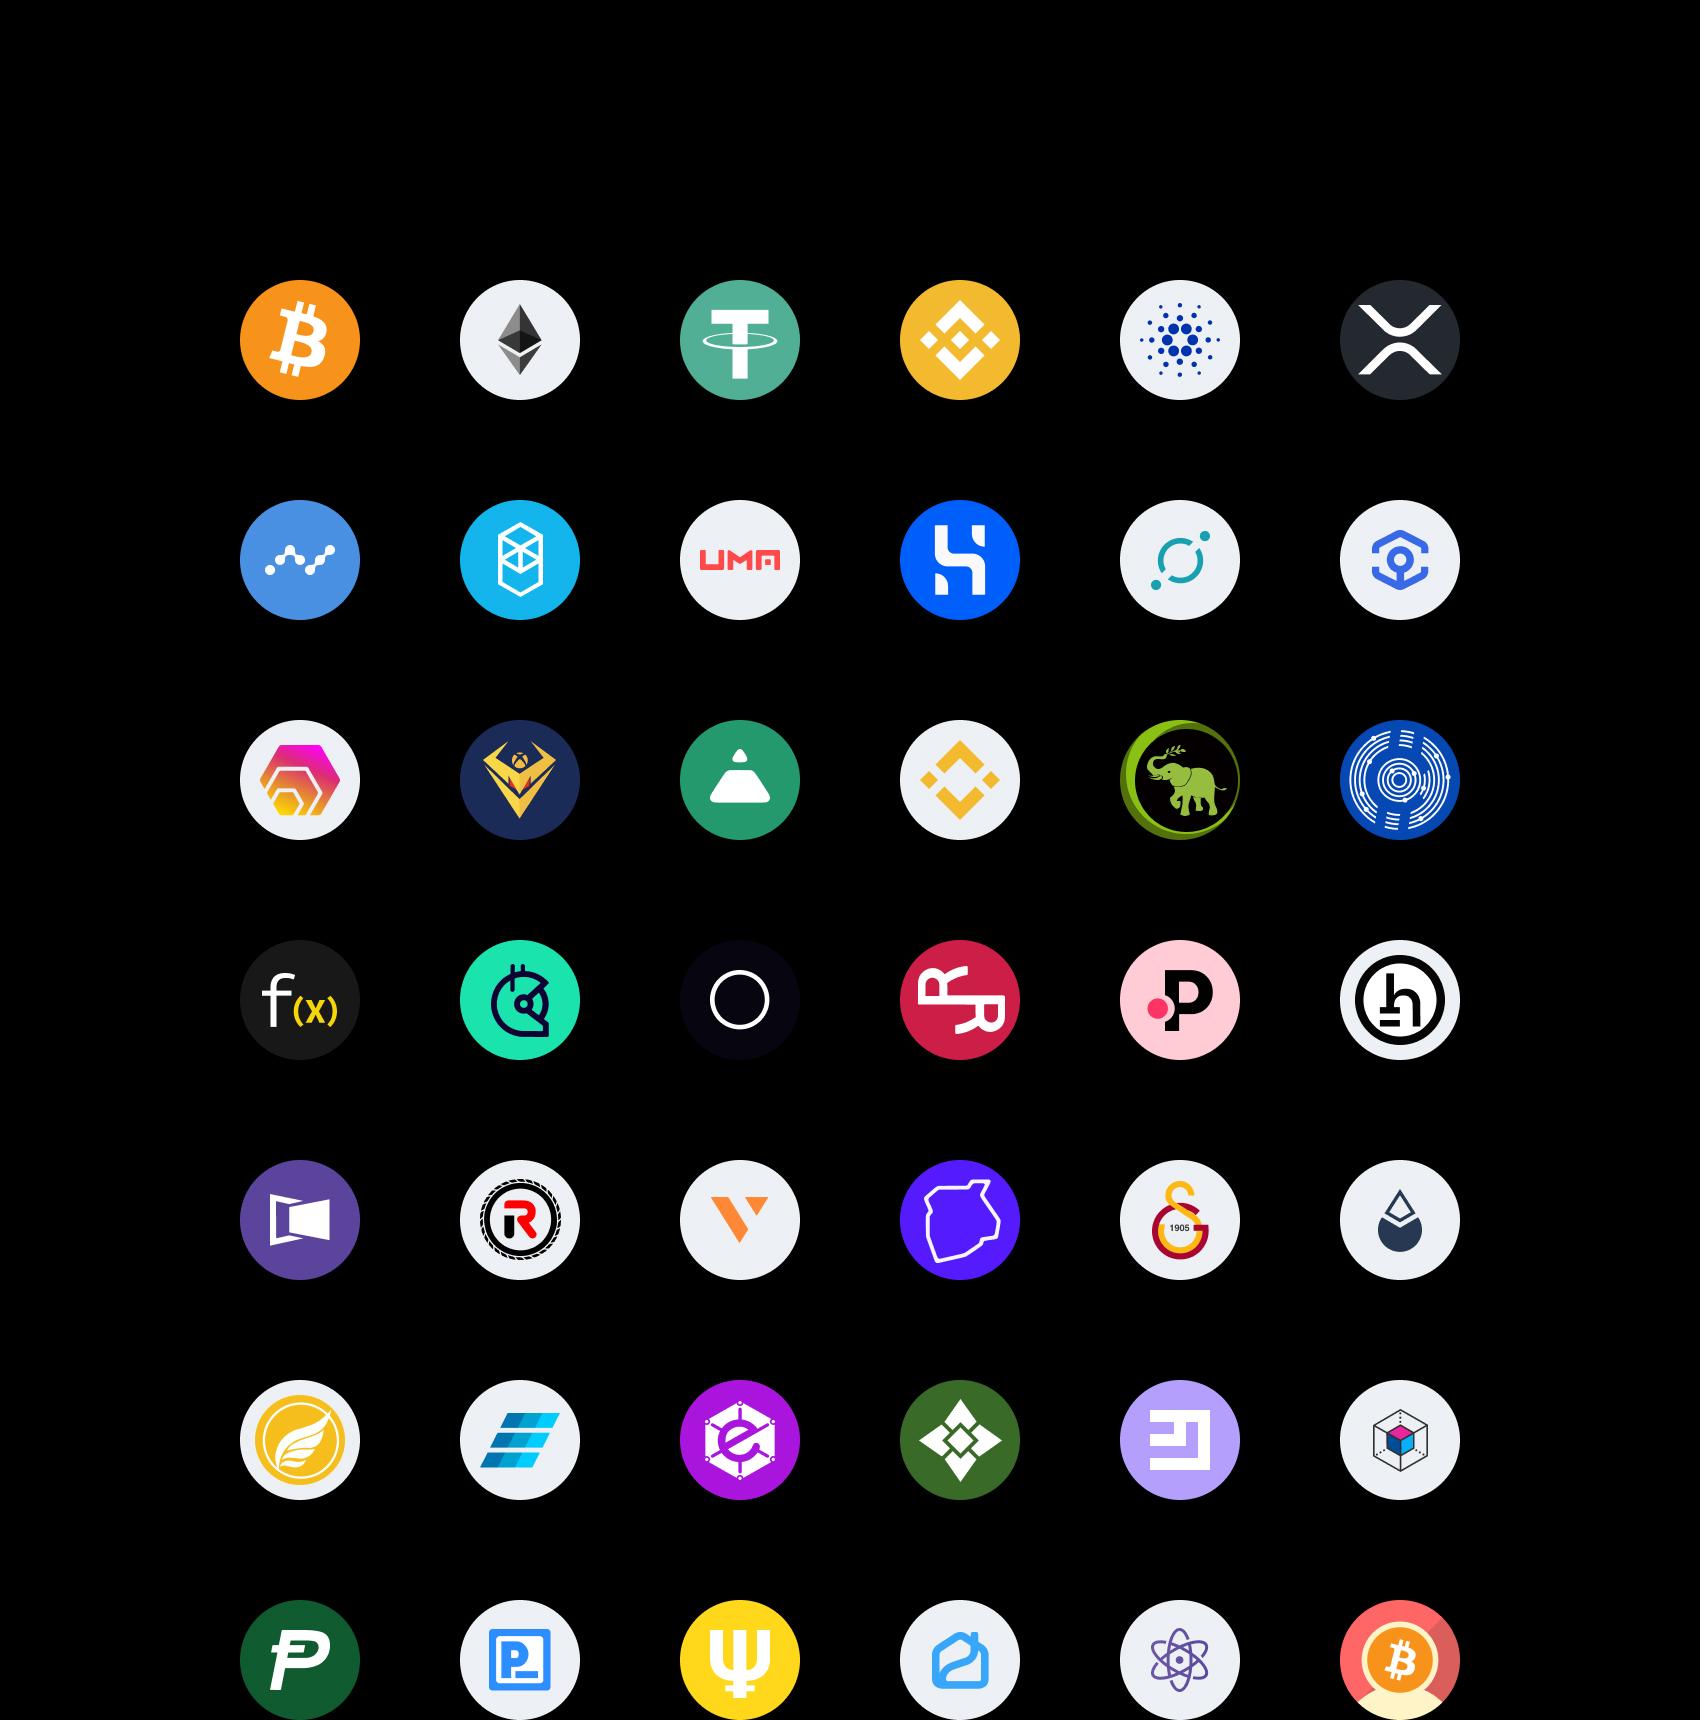 Bitcoin (BTC), Ethereum (ETH), Tether (USDT), Binance Coin (BNB), Cardano (ADA), XRP (XRP), Nano (NANO), Fantom (FTM), UMA (UMA), HUSD (HUSD), ICON (ICX), Ankr (ANKR), HEX (HEX), botXcoin (BOTX), Fei Protocol (FEI), Wrapped BNB (WBNB), Egoras (EGR), Counos X (CCXX), Function X (FX), Gitcoin (GTC), Empty Set Dollar (ESD), RChain (REV), Polkastarter (POLS), Hathor (HTR), MovieBloc (MBL), REVV (REVV), v.systems (VSYS), Telos (TLOS), Galatasaray Fan Token (GAL), Lido DAO Token (LDO), Egretia (Egt), Einsteinium (Emc2), Electra (Eca), Ellaism (Ella), Emercoin (Emc), Enigma (Eng), Potcoin (Pot), Presearch (Pre), Primecoin (Xpm), Propy (Pro), Proton (Xpr), Ptokens Btc (Pbtc)